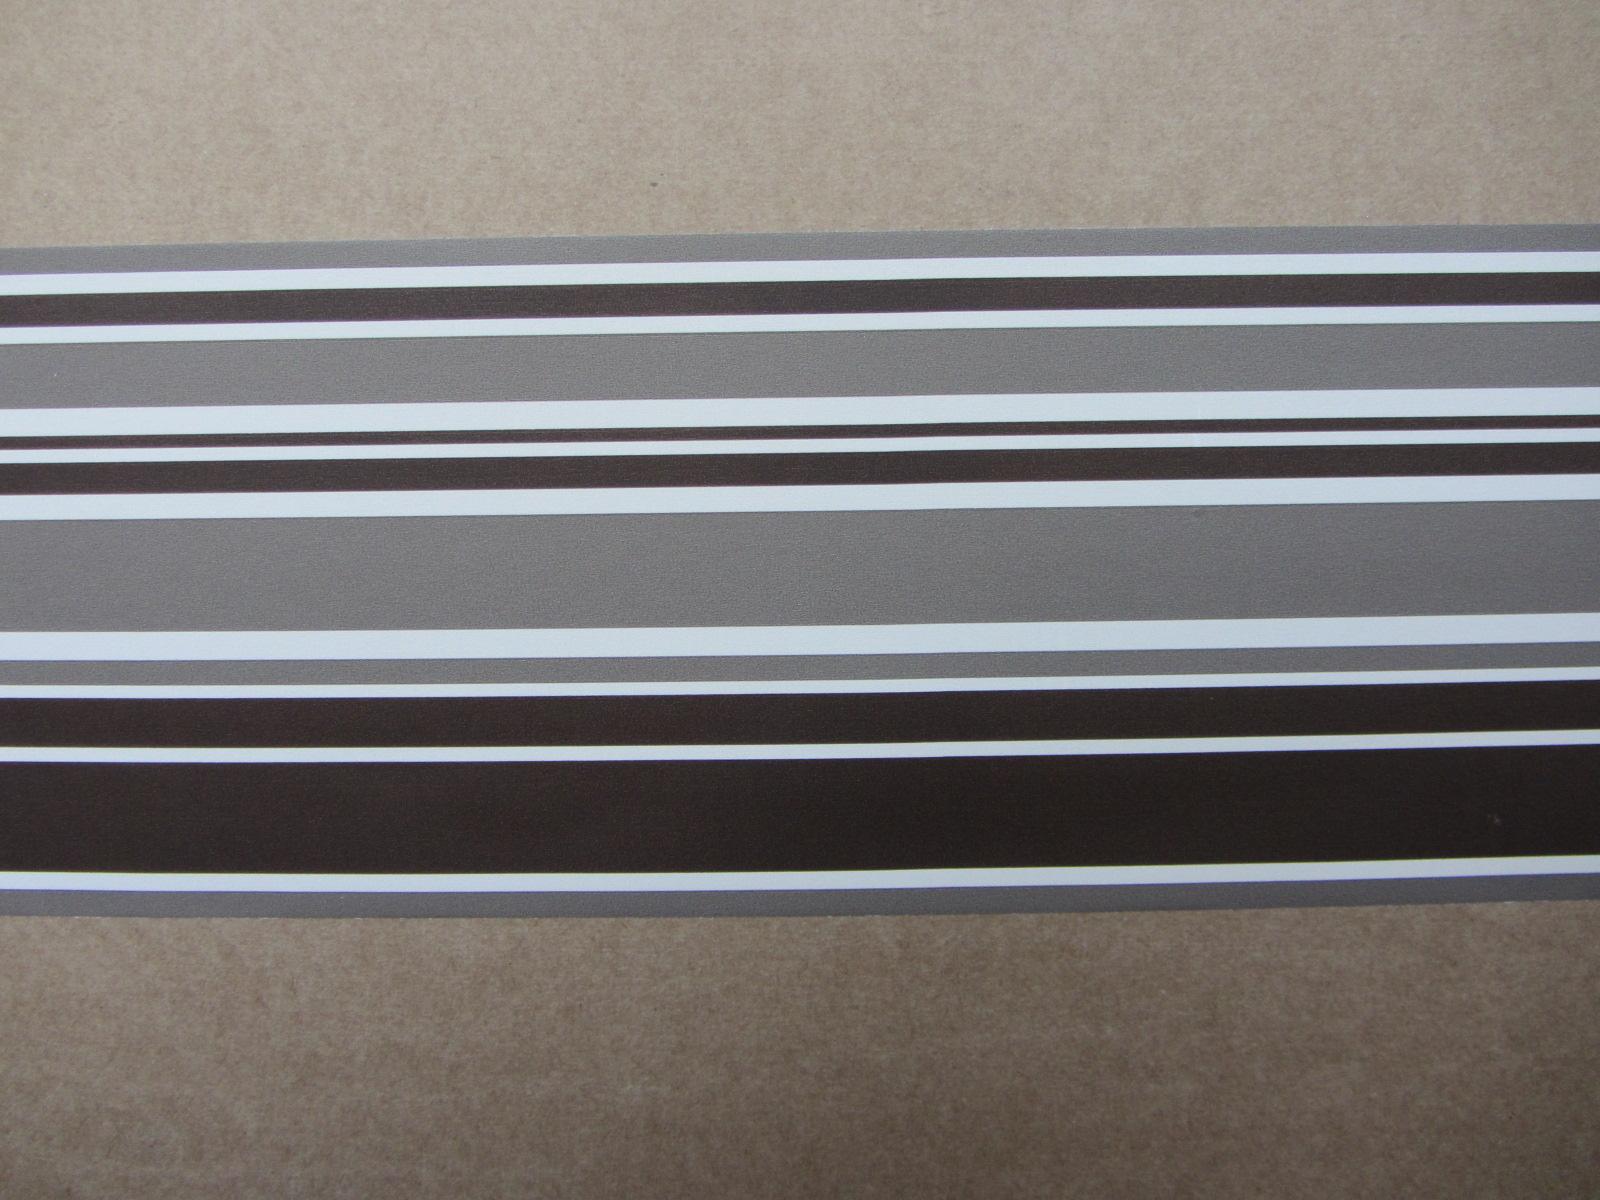 STRIPE CHOCOLATE WALLPAPER BORDER SELF ADHESIVE BEDROOM HALLWAY LOUNGE 1600x1200